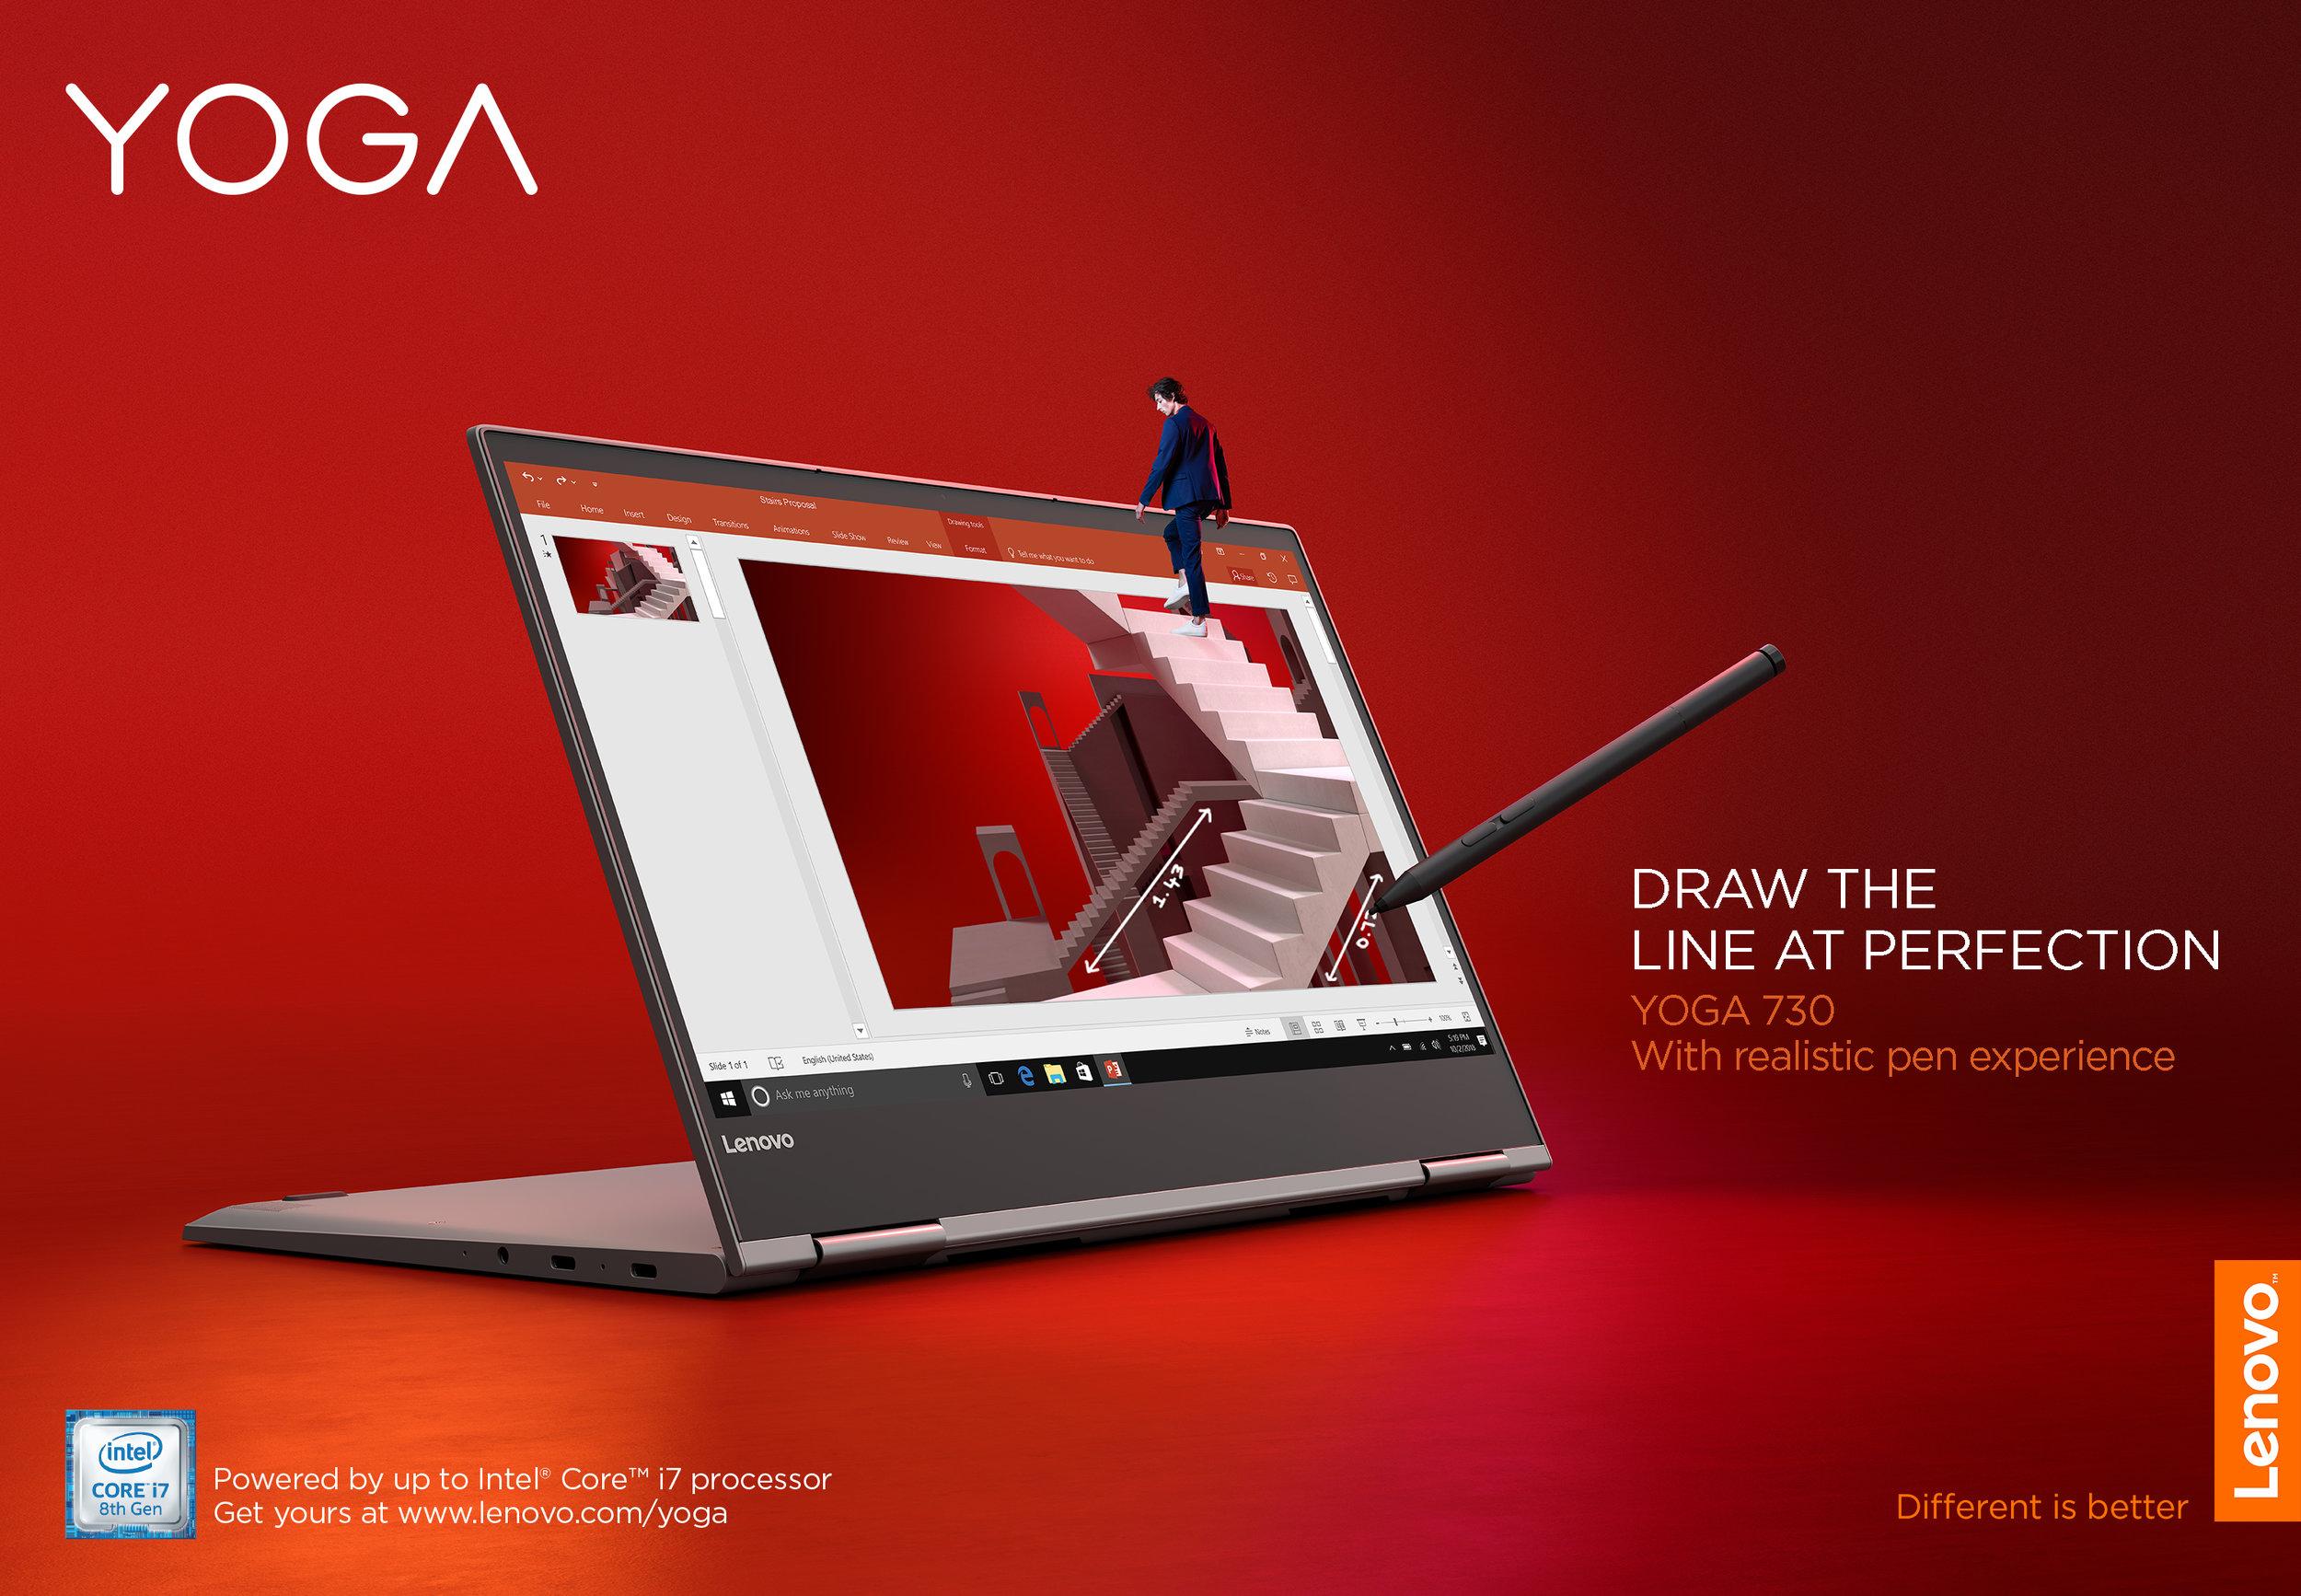 Yoga-730.jpg